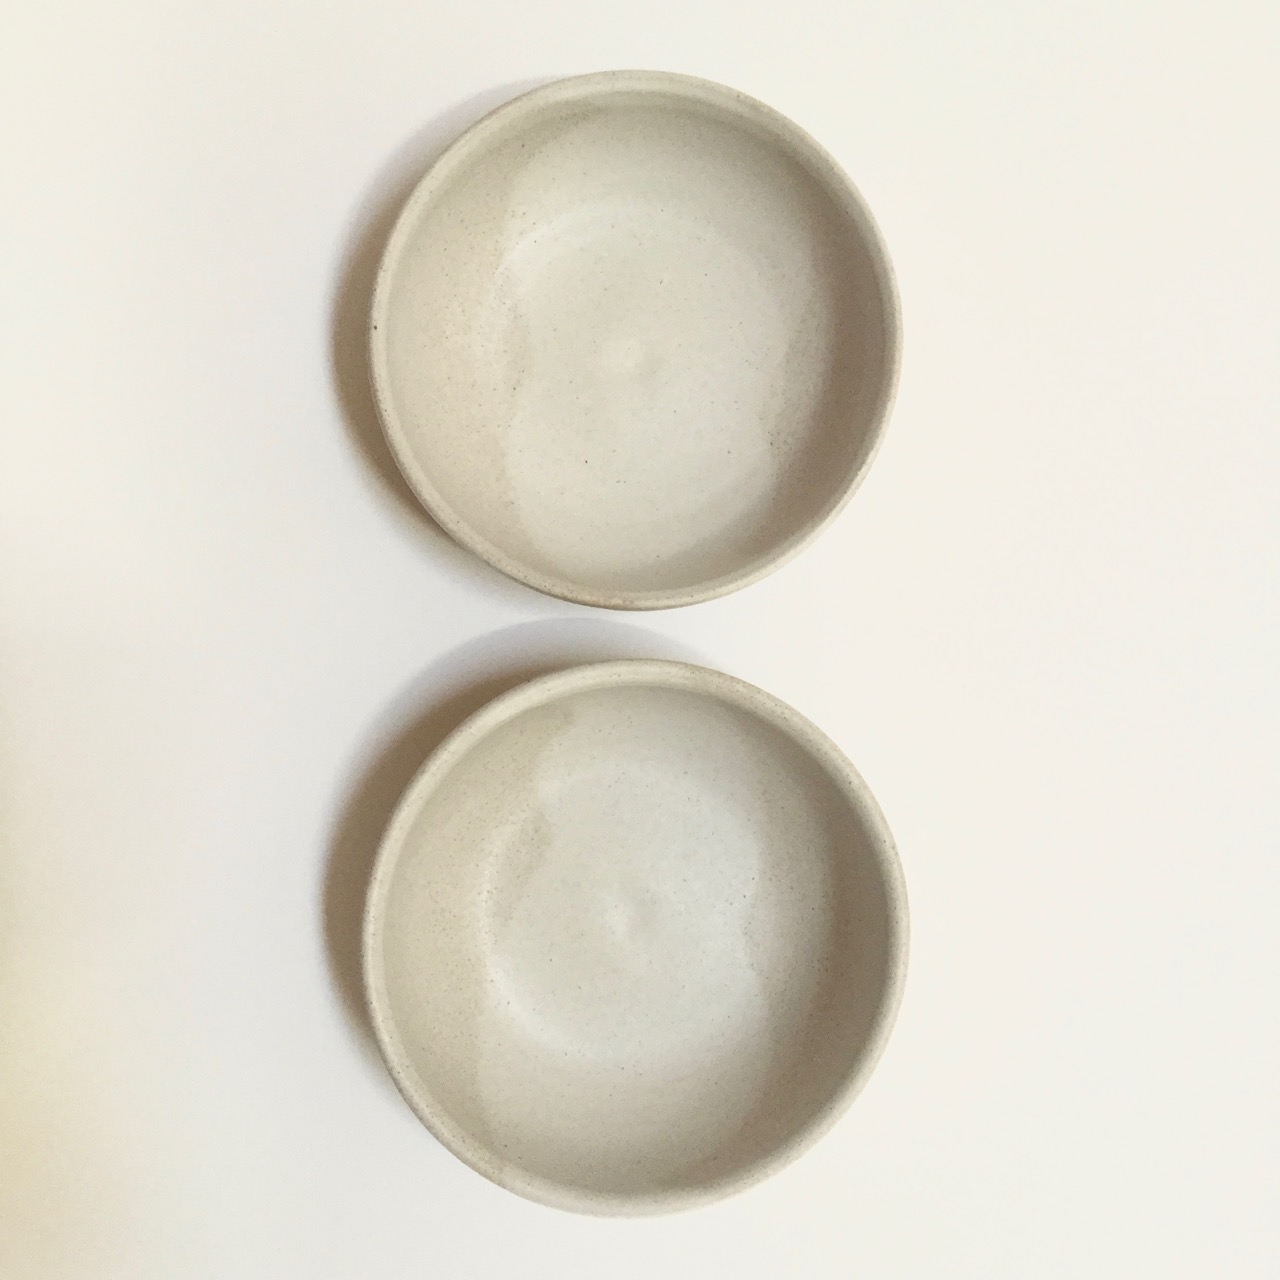 1058 Pair of white sand ice cream from top.jpg